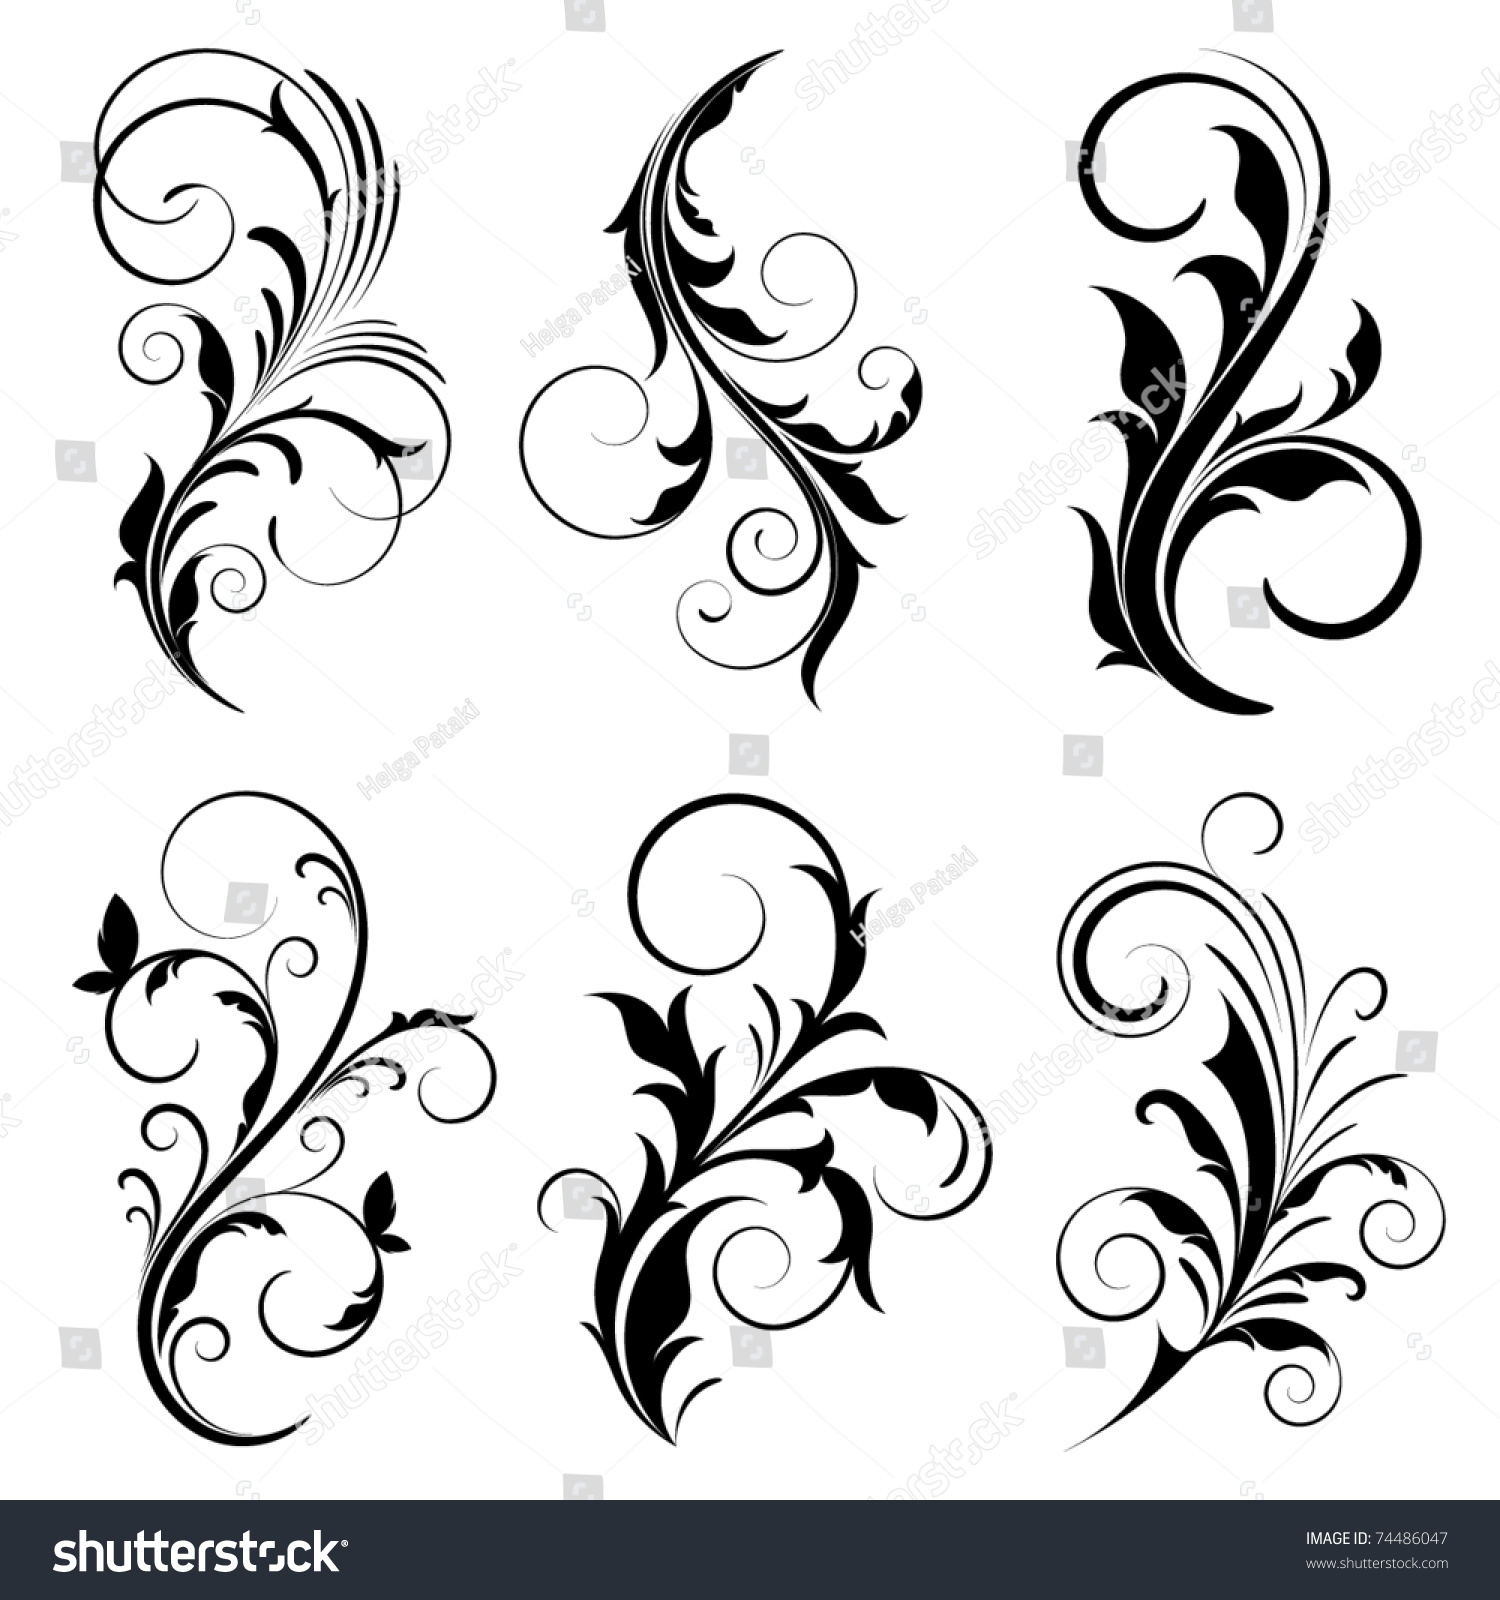 Set Of Black Flower Design Elements Vector Illustration: Set Of Floral Elements For Design. Stock Vector